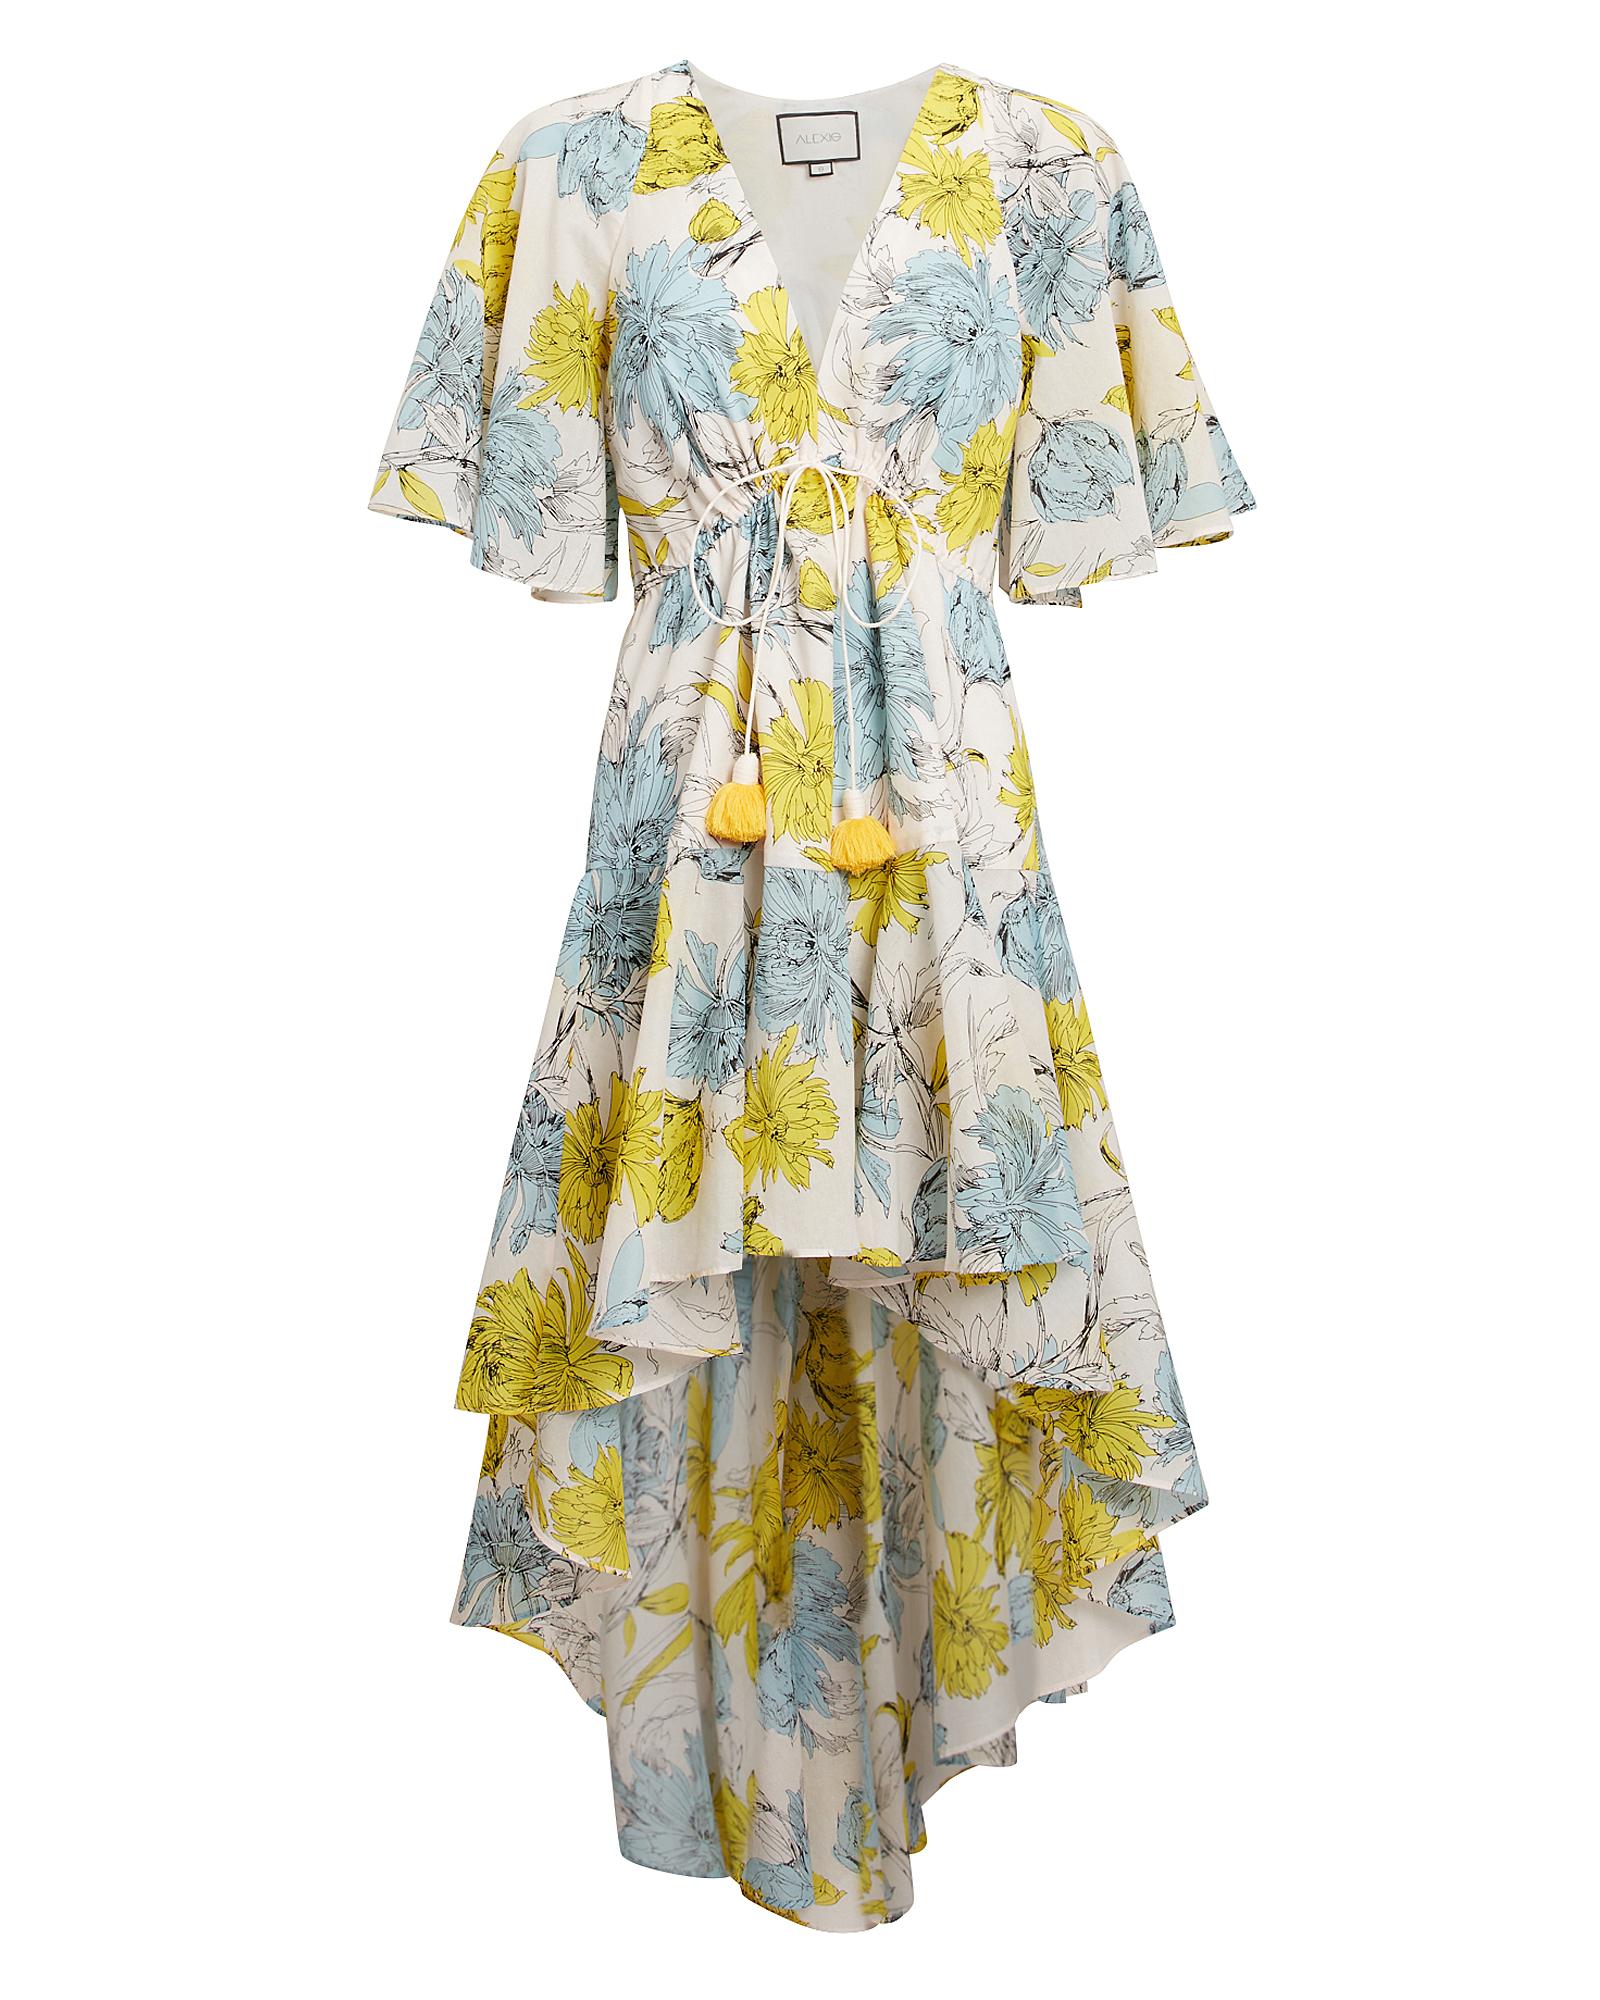 Alexis Dresses Idella High-Low Dress